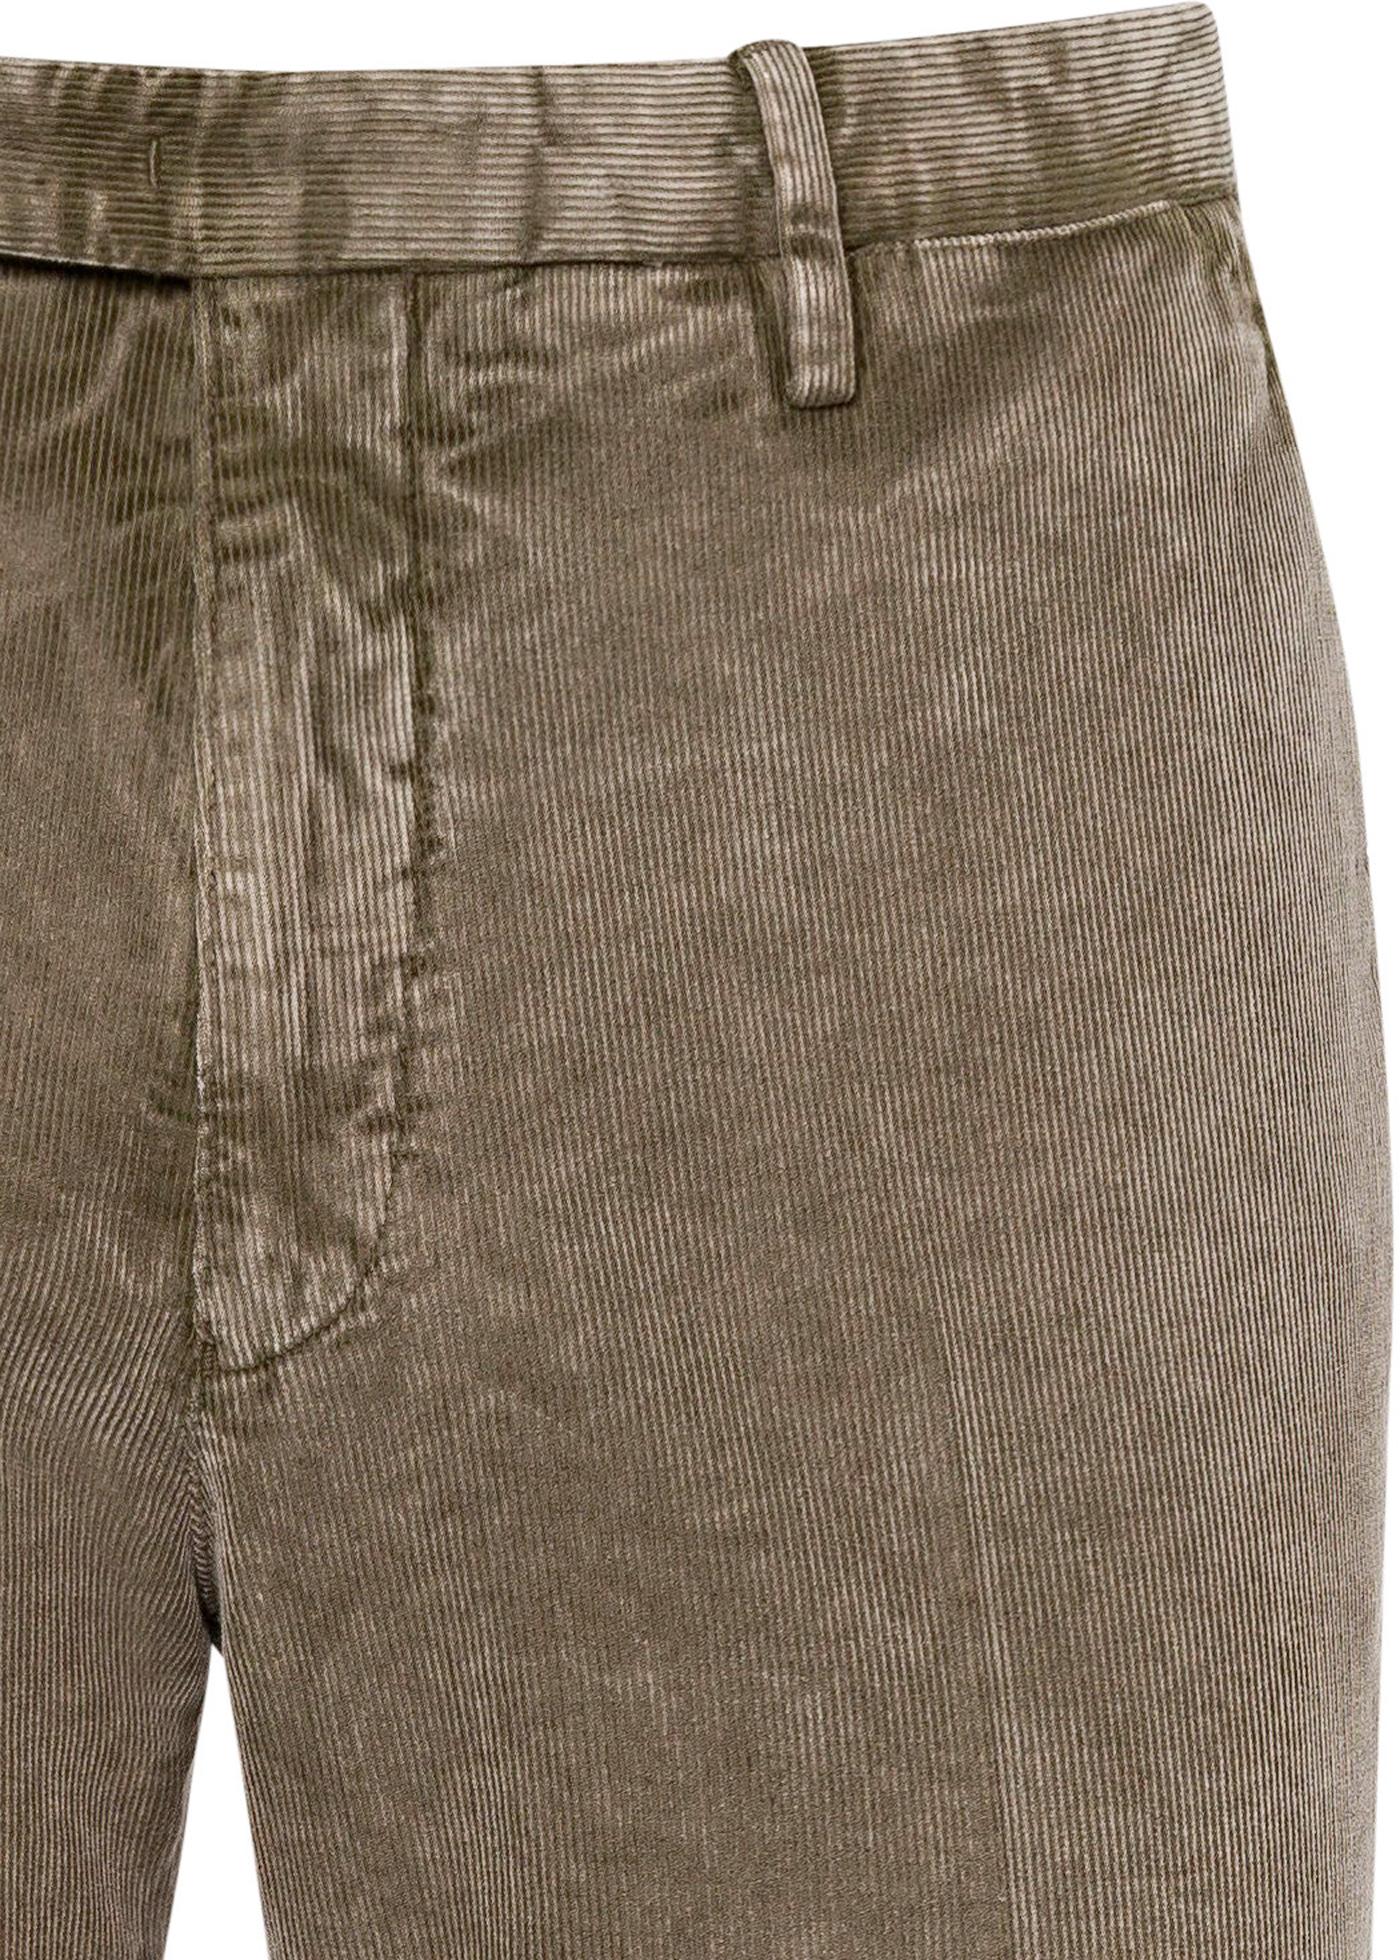 Washed Corduroy Pants image number 2